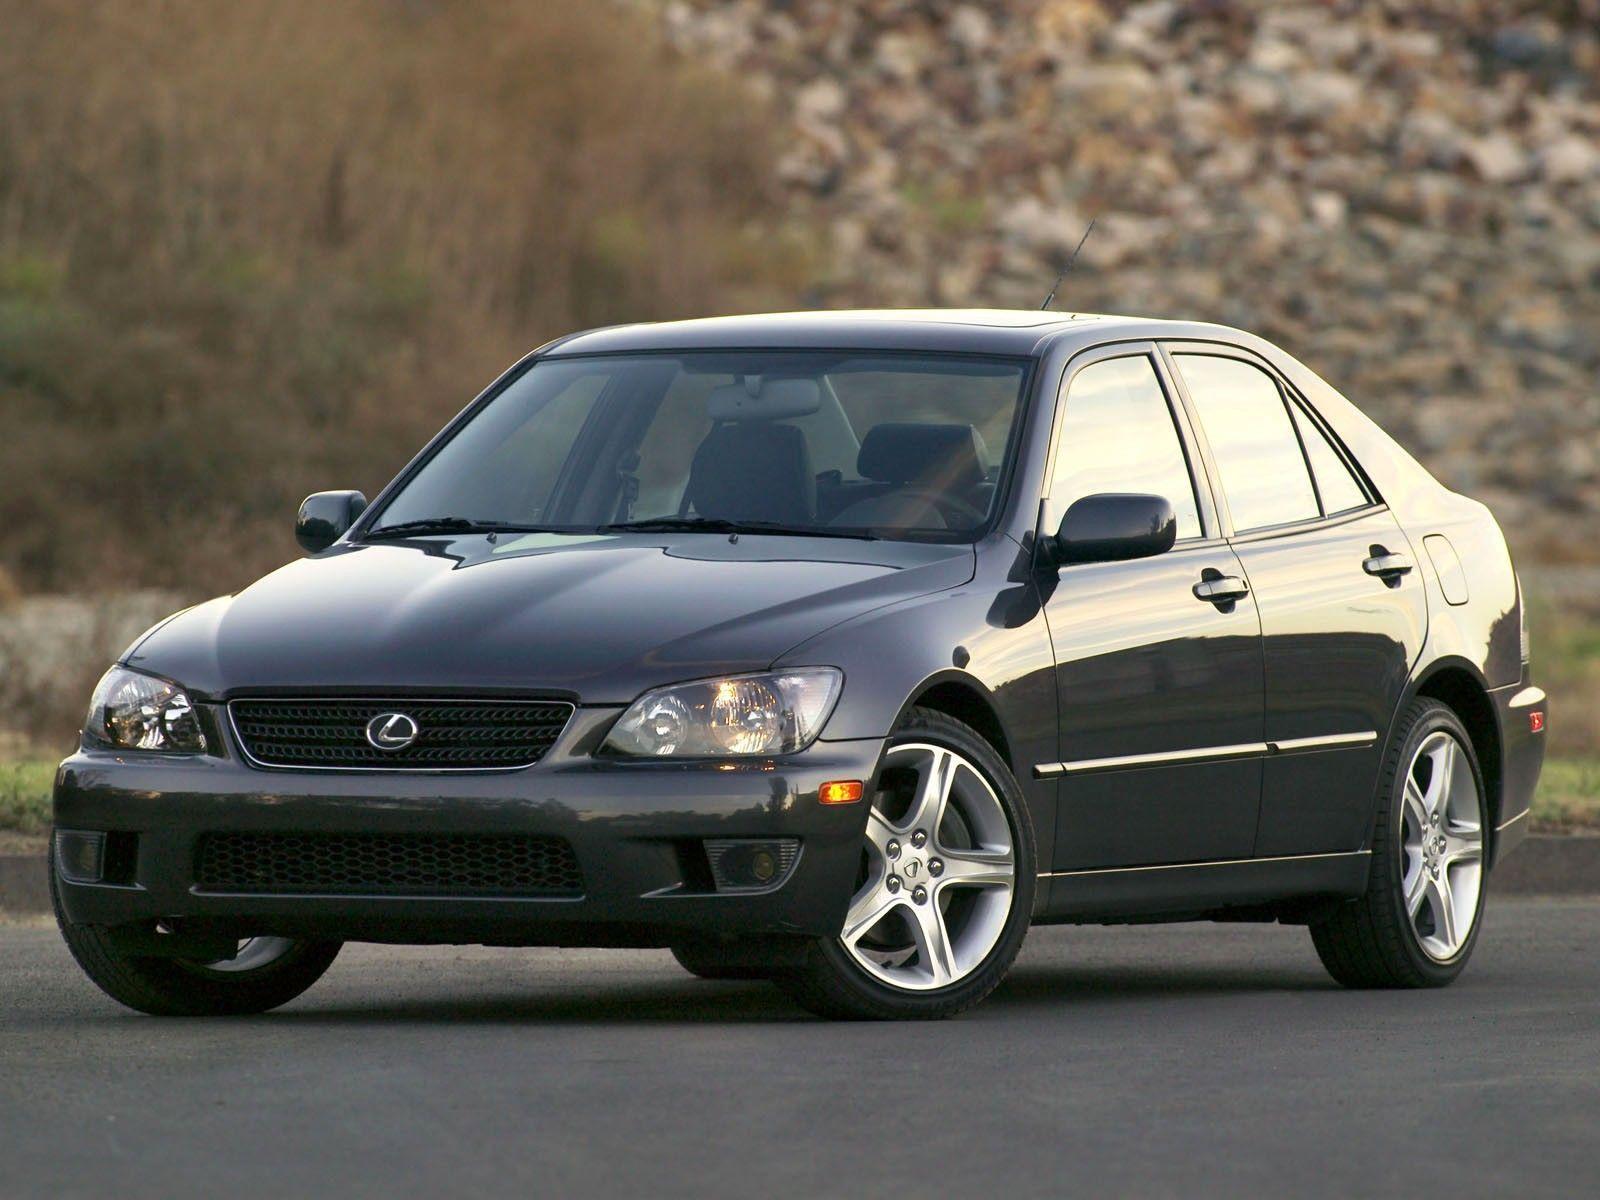 Lexus Is300 Lexusis300 Lexus Is300 Lexusis300 Lexus Is300 Lexusis300 Lexus Is300 Lexus Is300 Lexus Car Repair Service